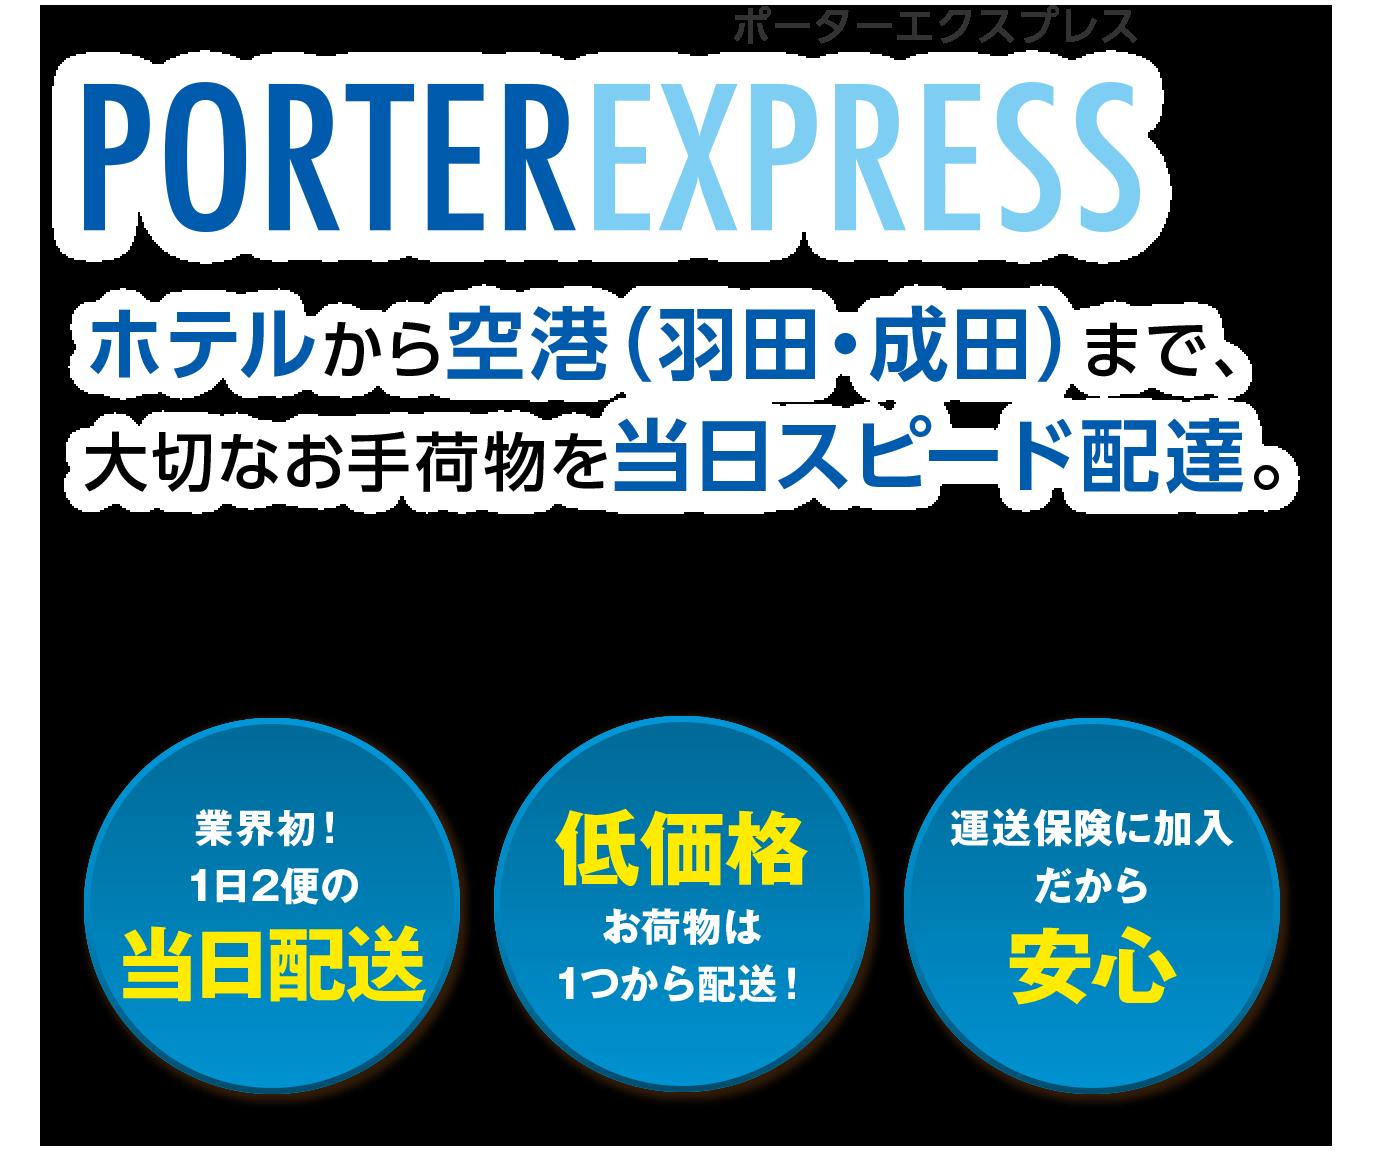 PORTER EXPRESS LUGGAGE TRANSFER ホテルから空港(羽田・成田)まで、 大切なお手荷物をスピード配達